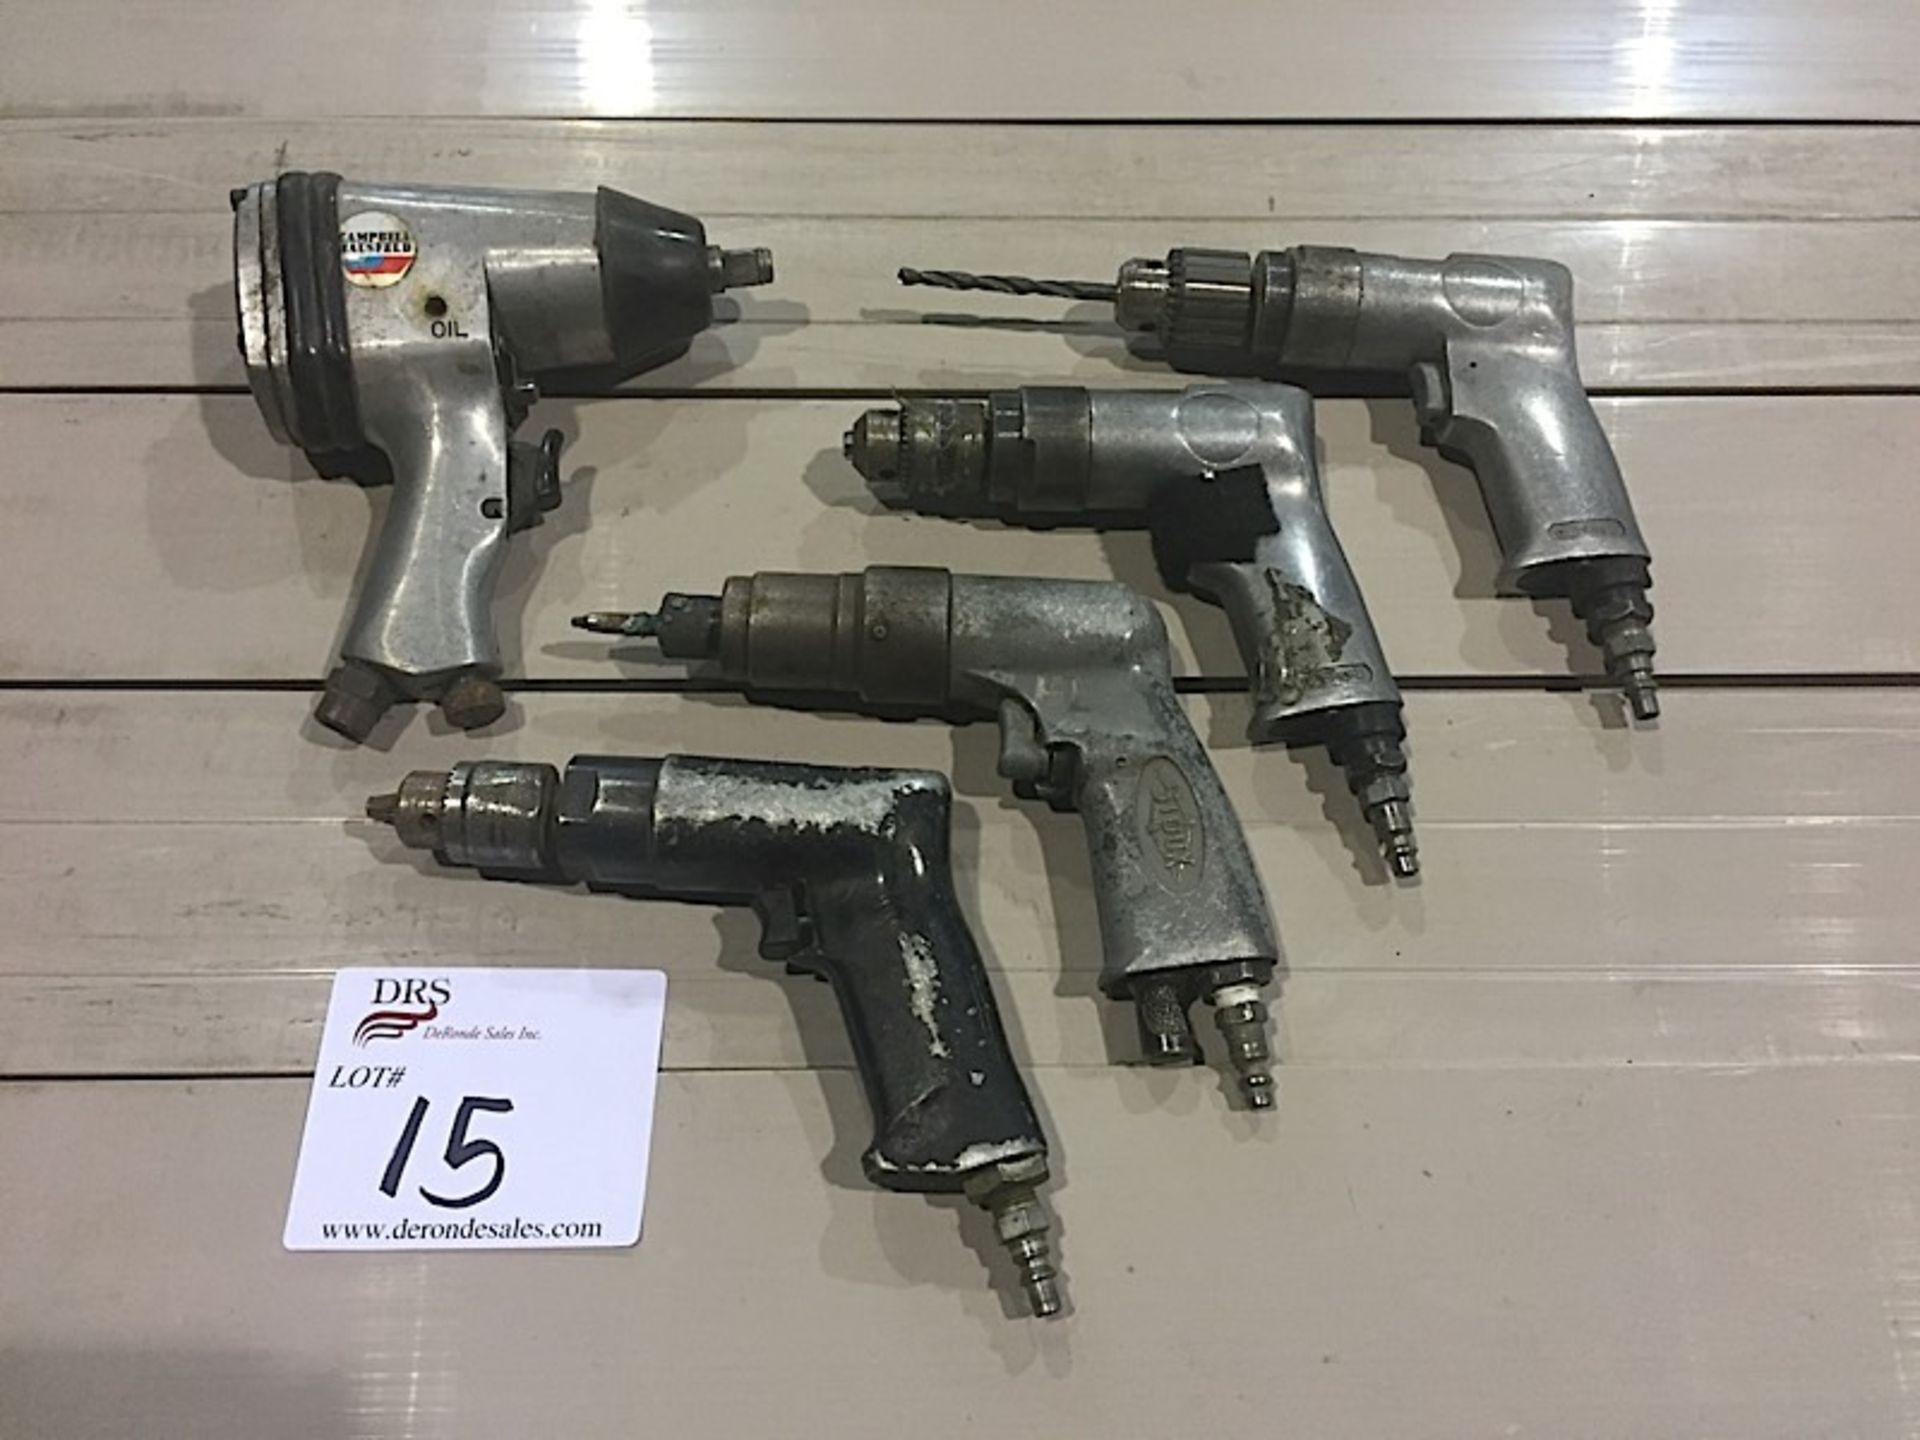 LOT OF PNEUMATIC SCREW GUNS